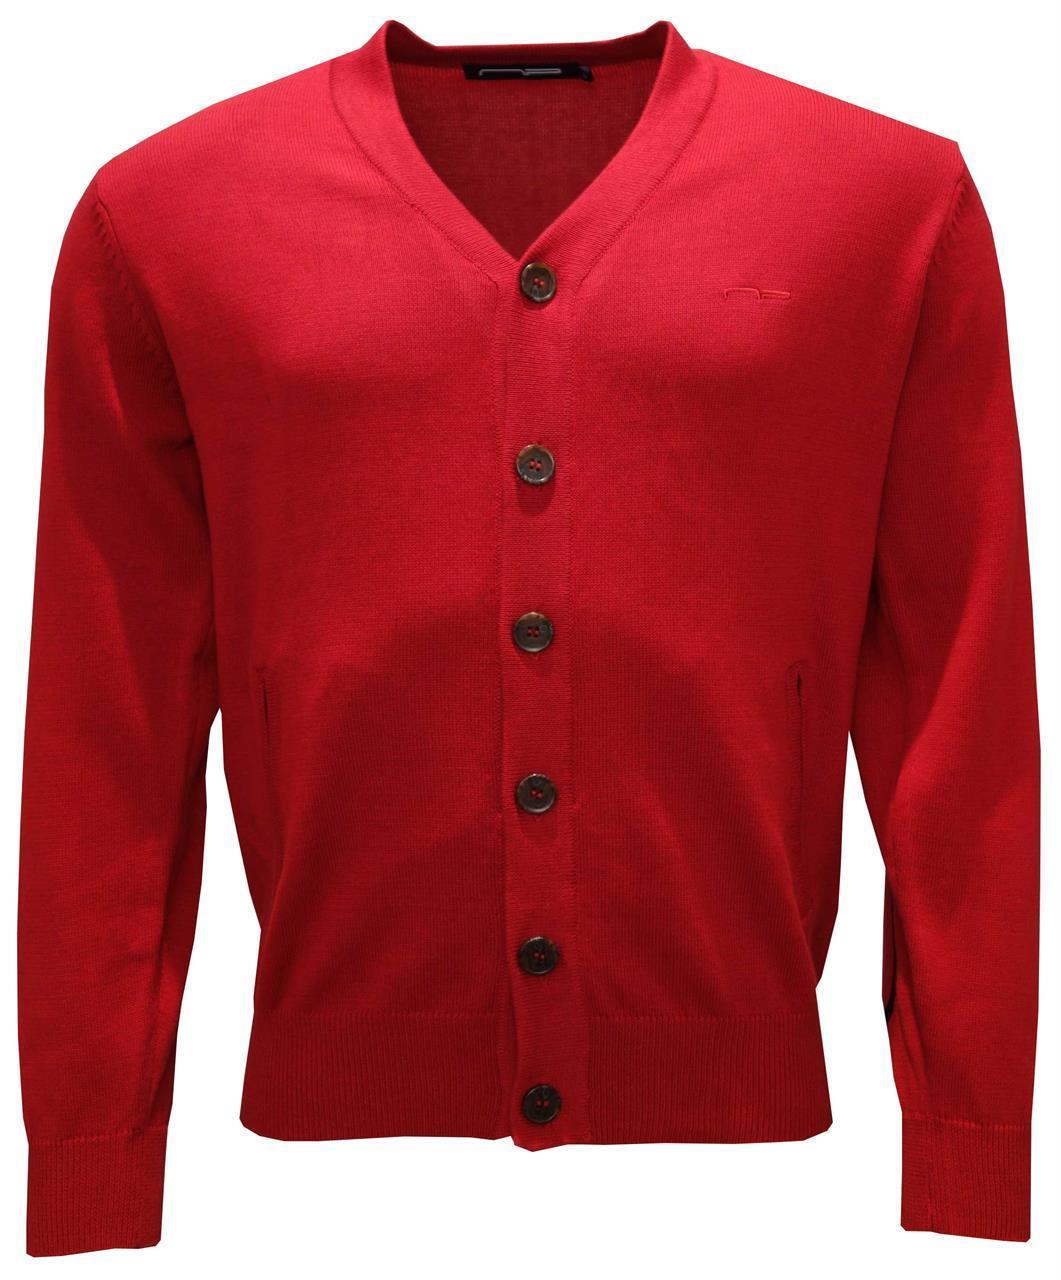 Cardigan 2053 Red S